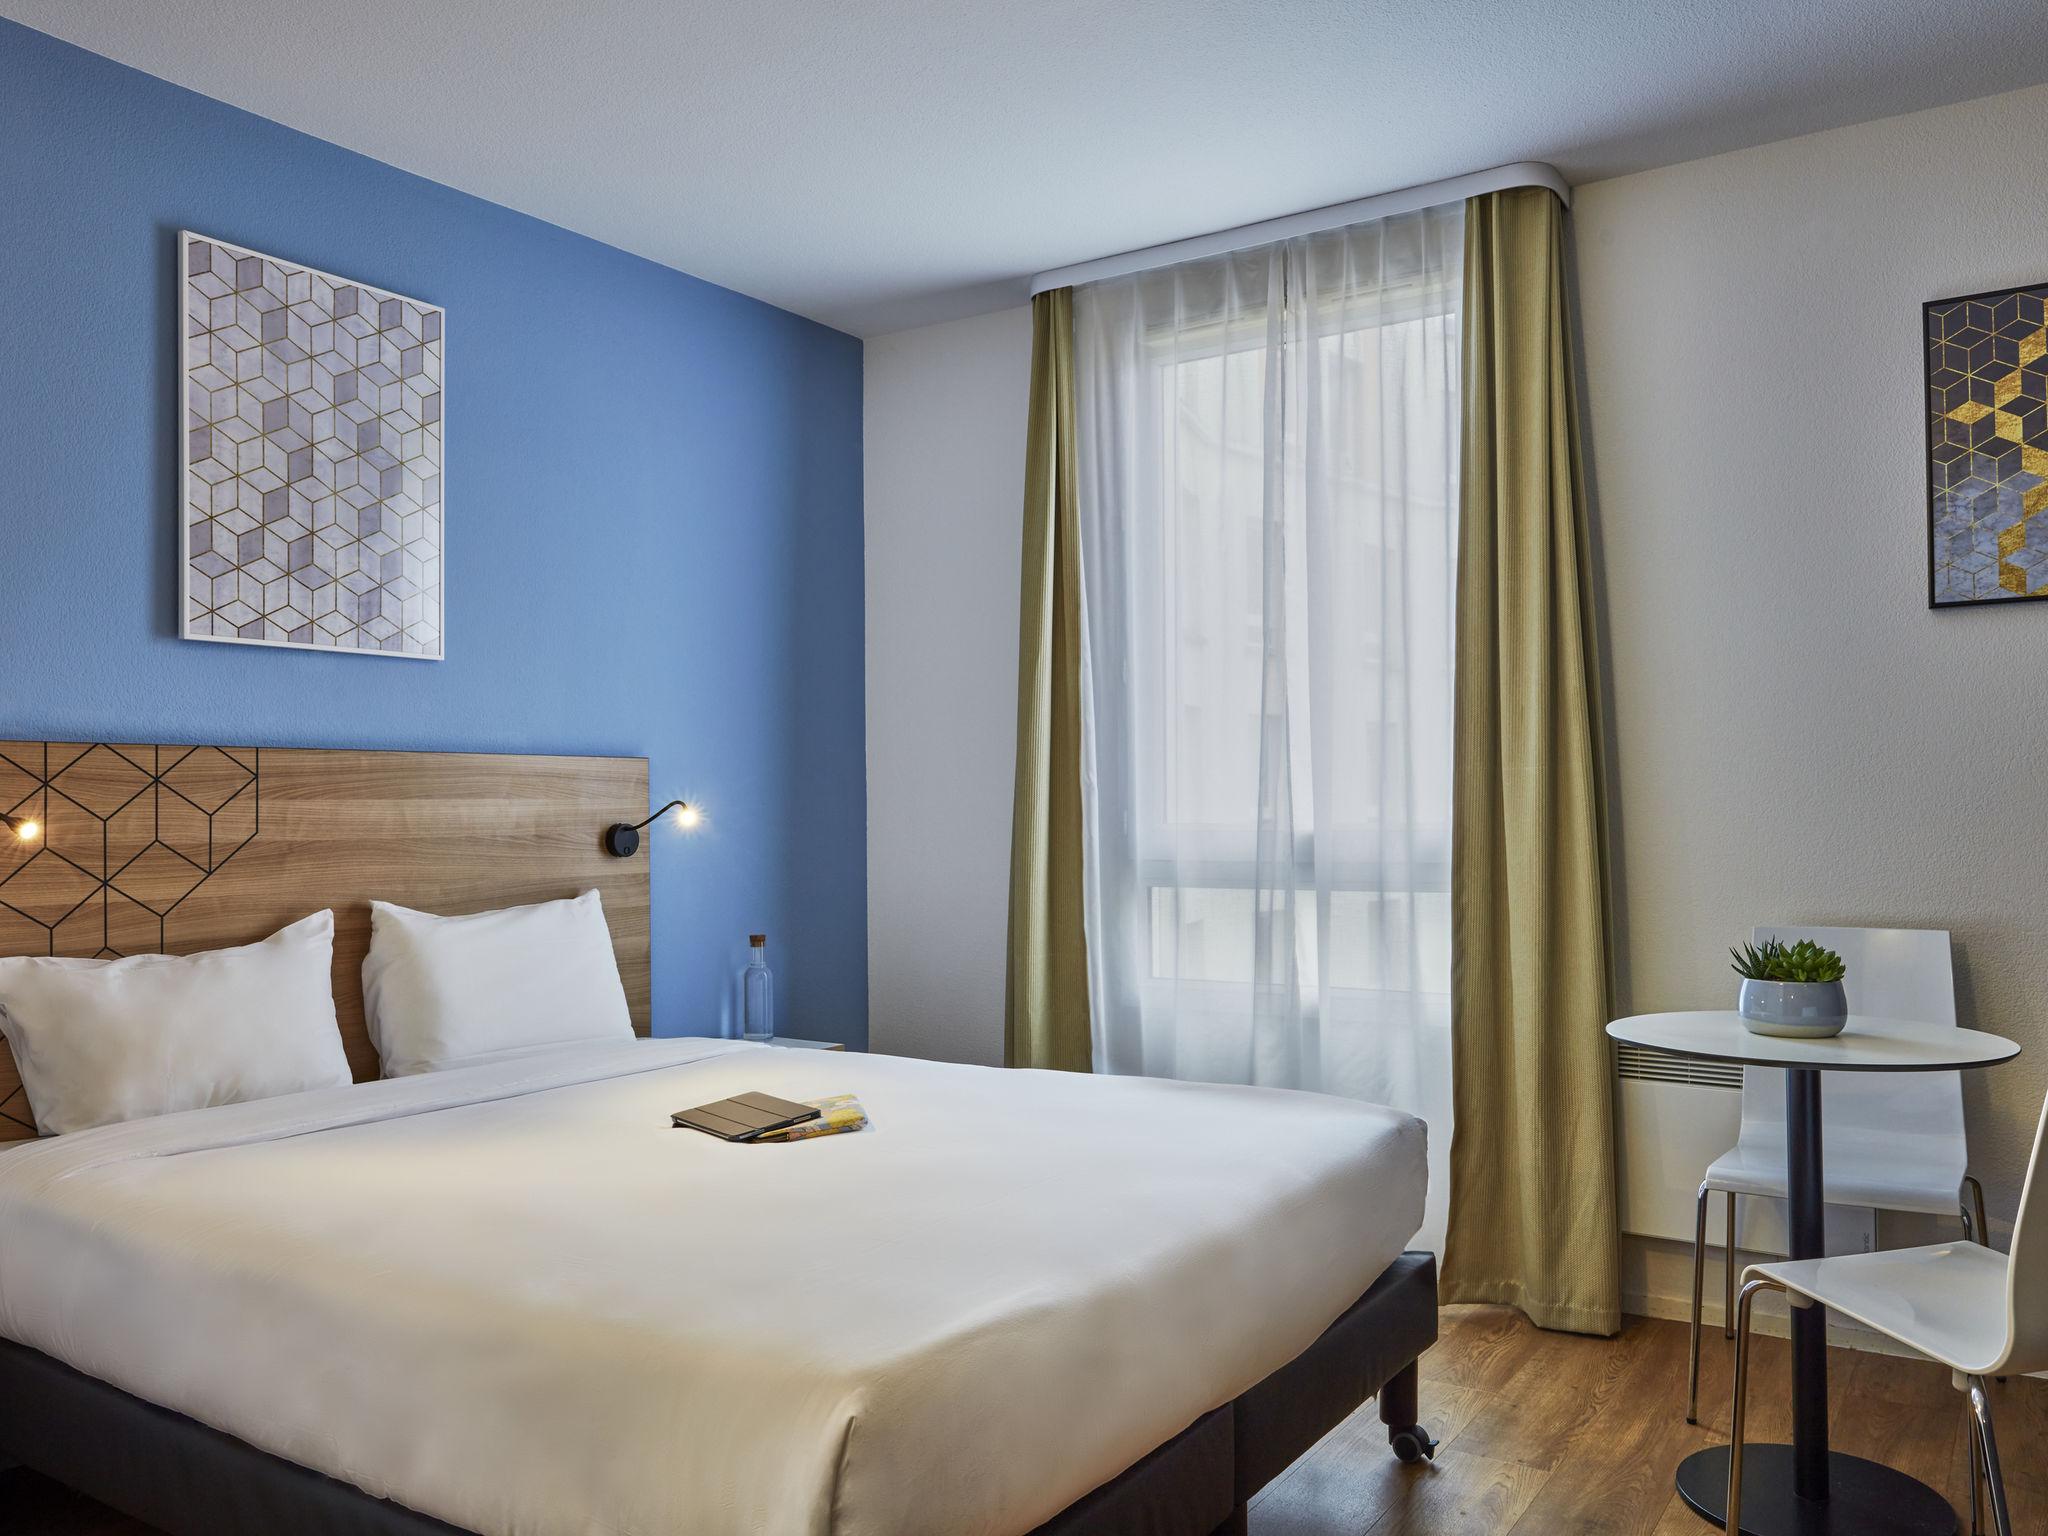 Hotel – Hotel de apartamentos Adagio access Paris Quai d'Ivry